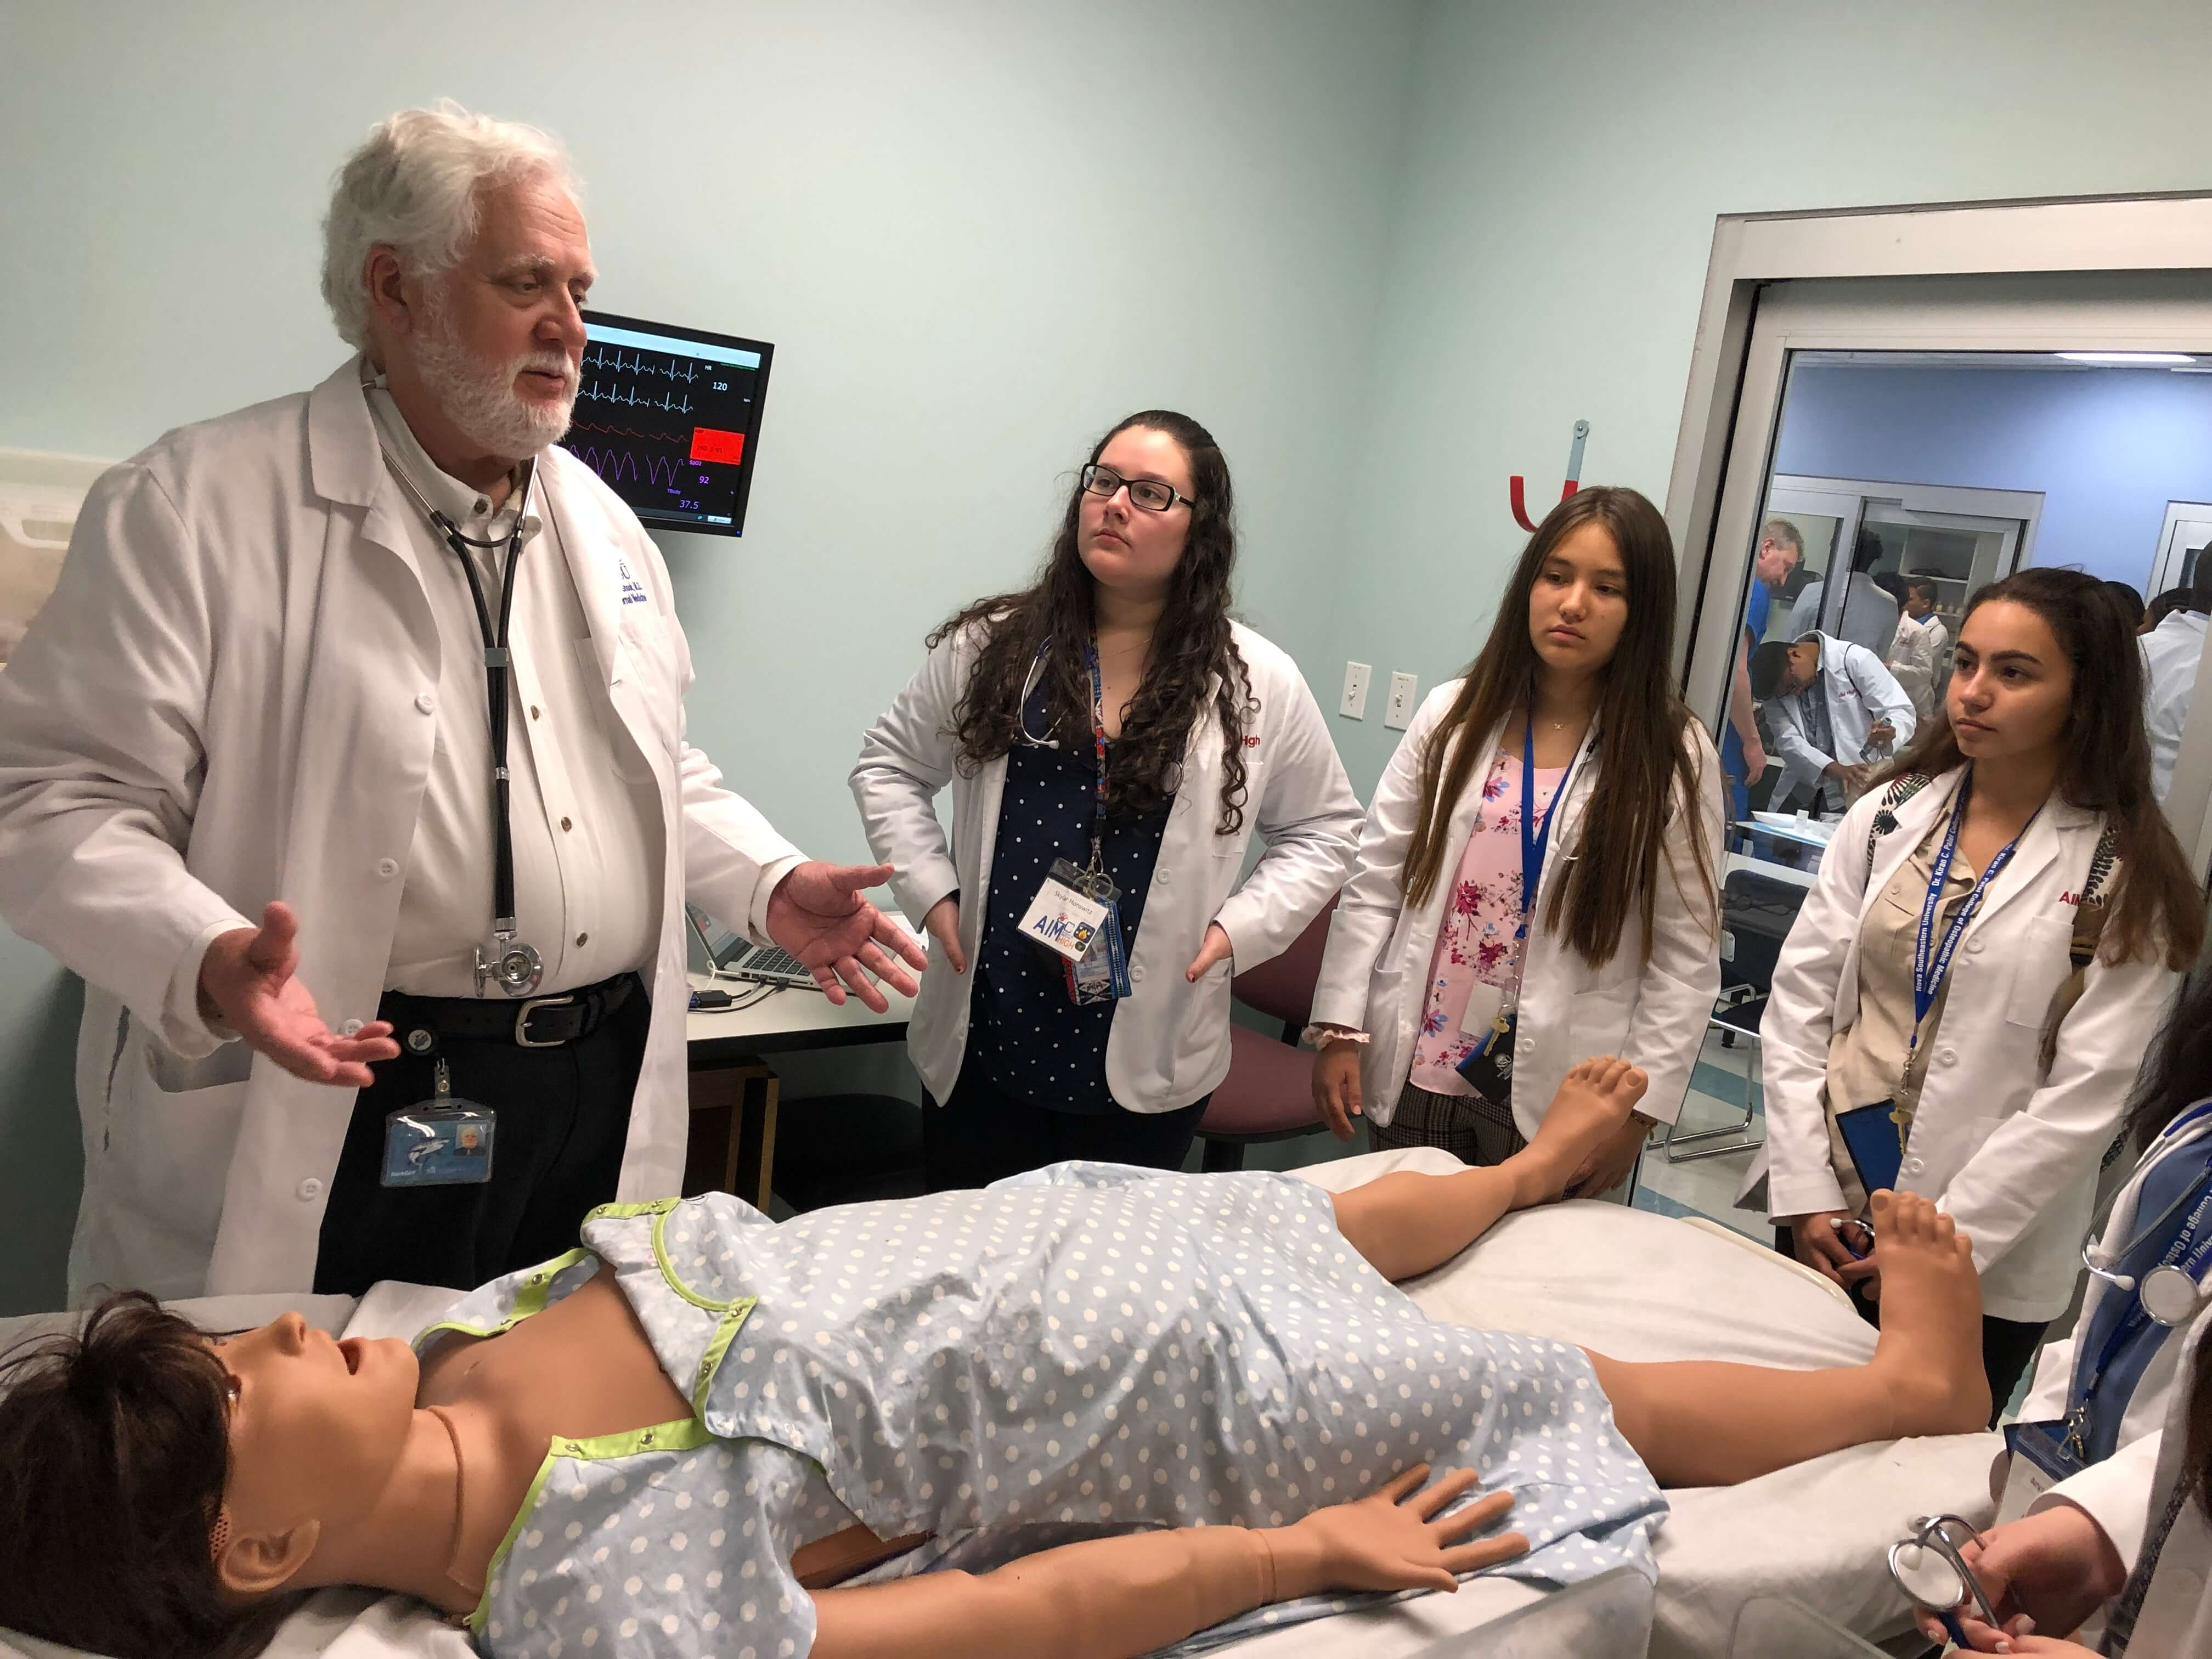 Summer Program - Pre-Med | NSU: AIM-High Medical Immersion Program